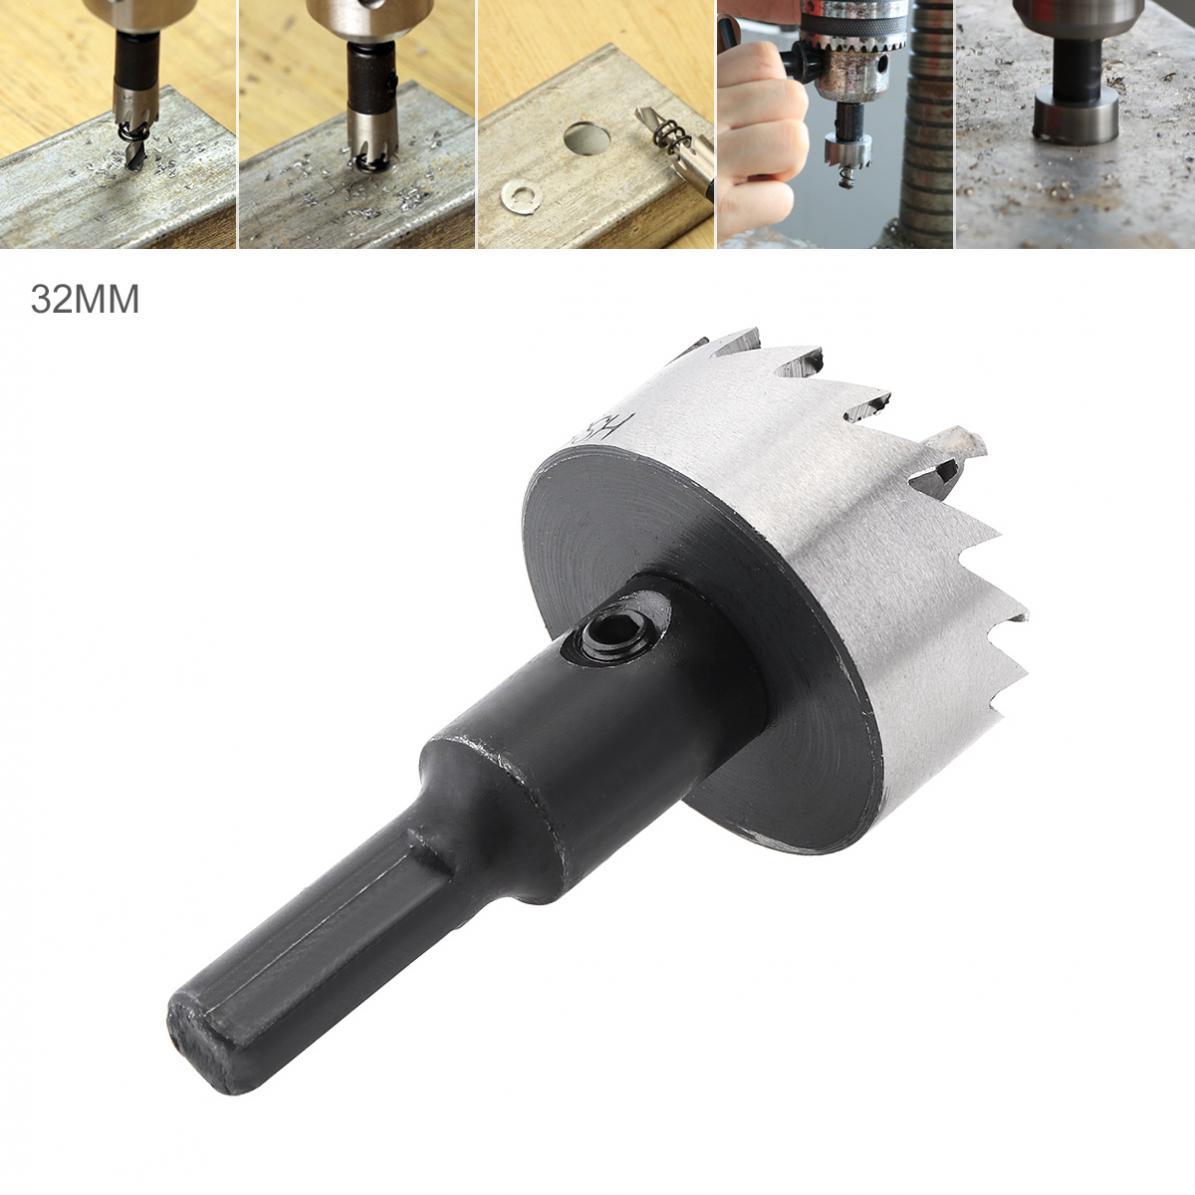 Taladro cortador de sierra de 32mm HSS para taladros de pistola/taladros de banco/taladros magnéticos/taladros de pistola de aire